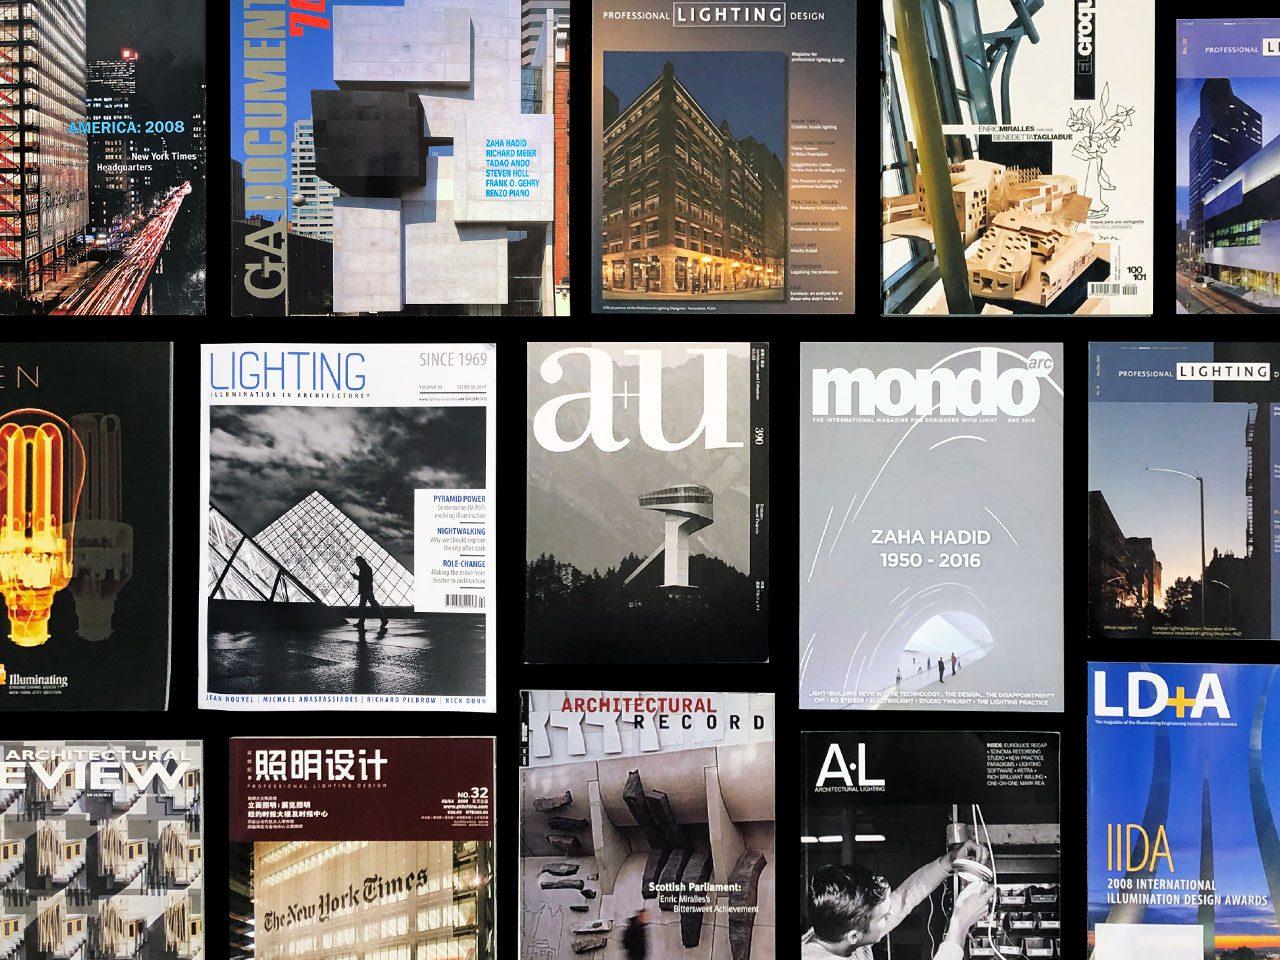 Magazin cover featuring OVI